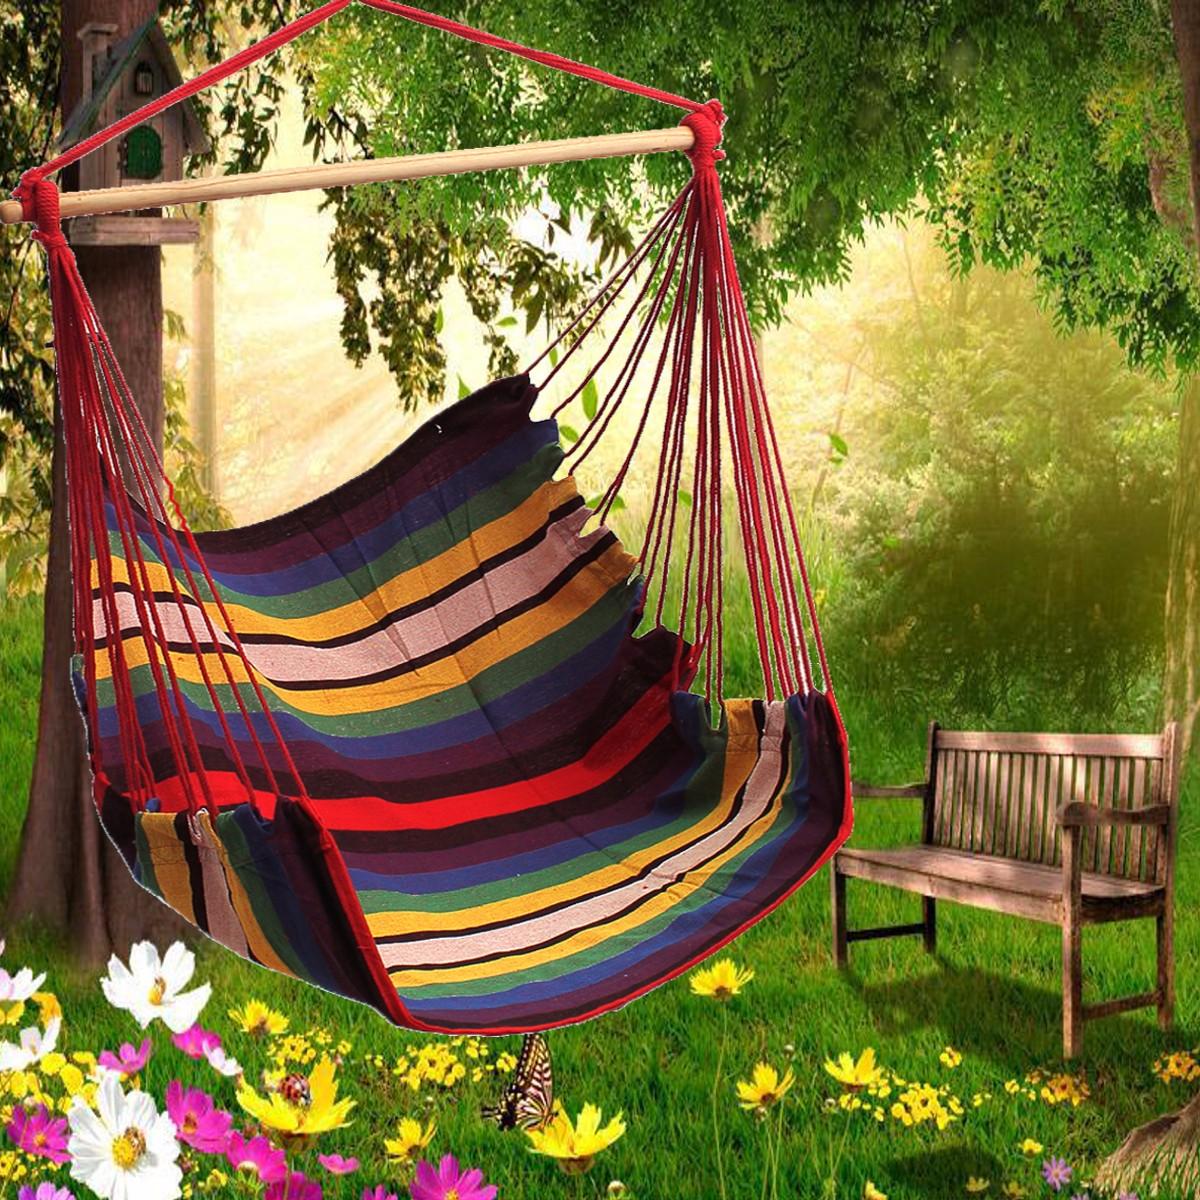 Garden Patio Hanging Thicken Hammock Chair Indoor Outdo